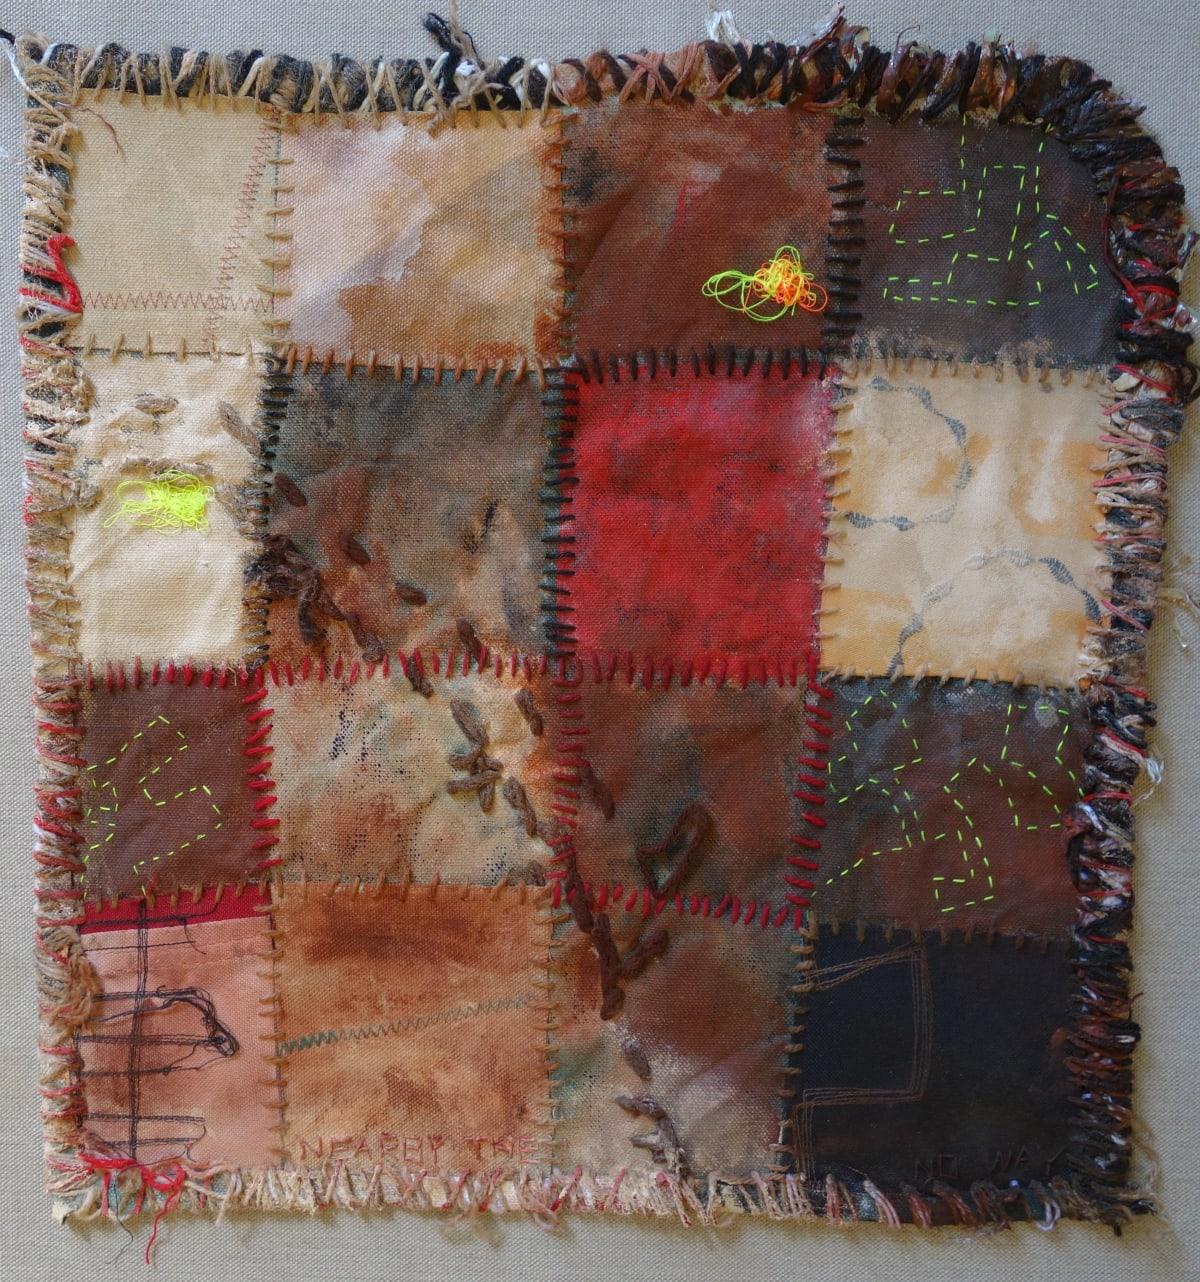 Stephen Eastaugh MUDMAPS 3 (Nearby the No way) Broome acrylic, thread, linen 45 x 45 cm